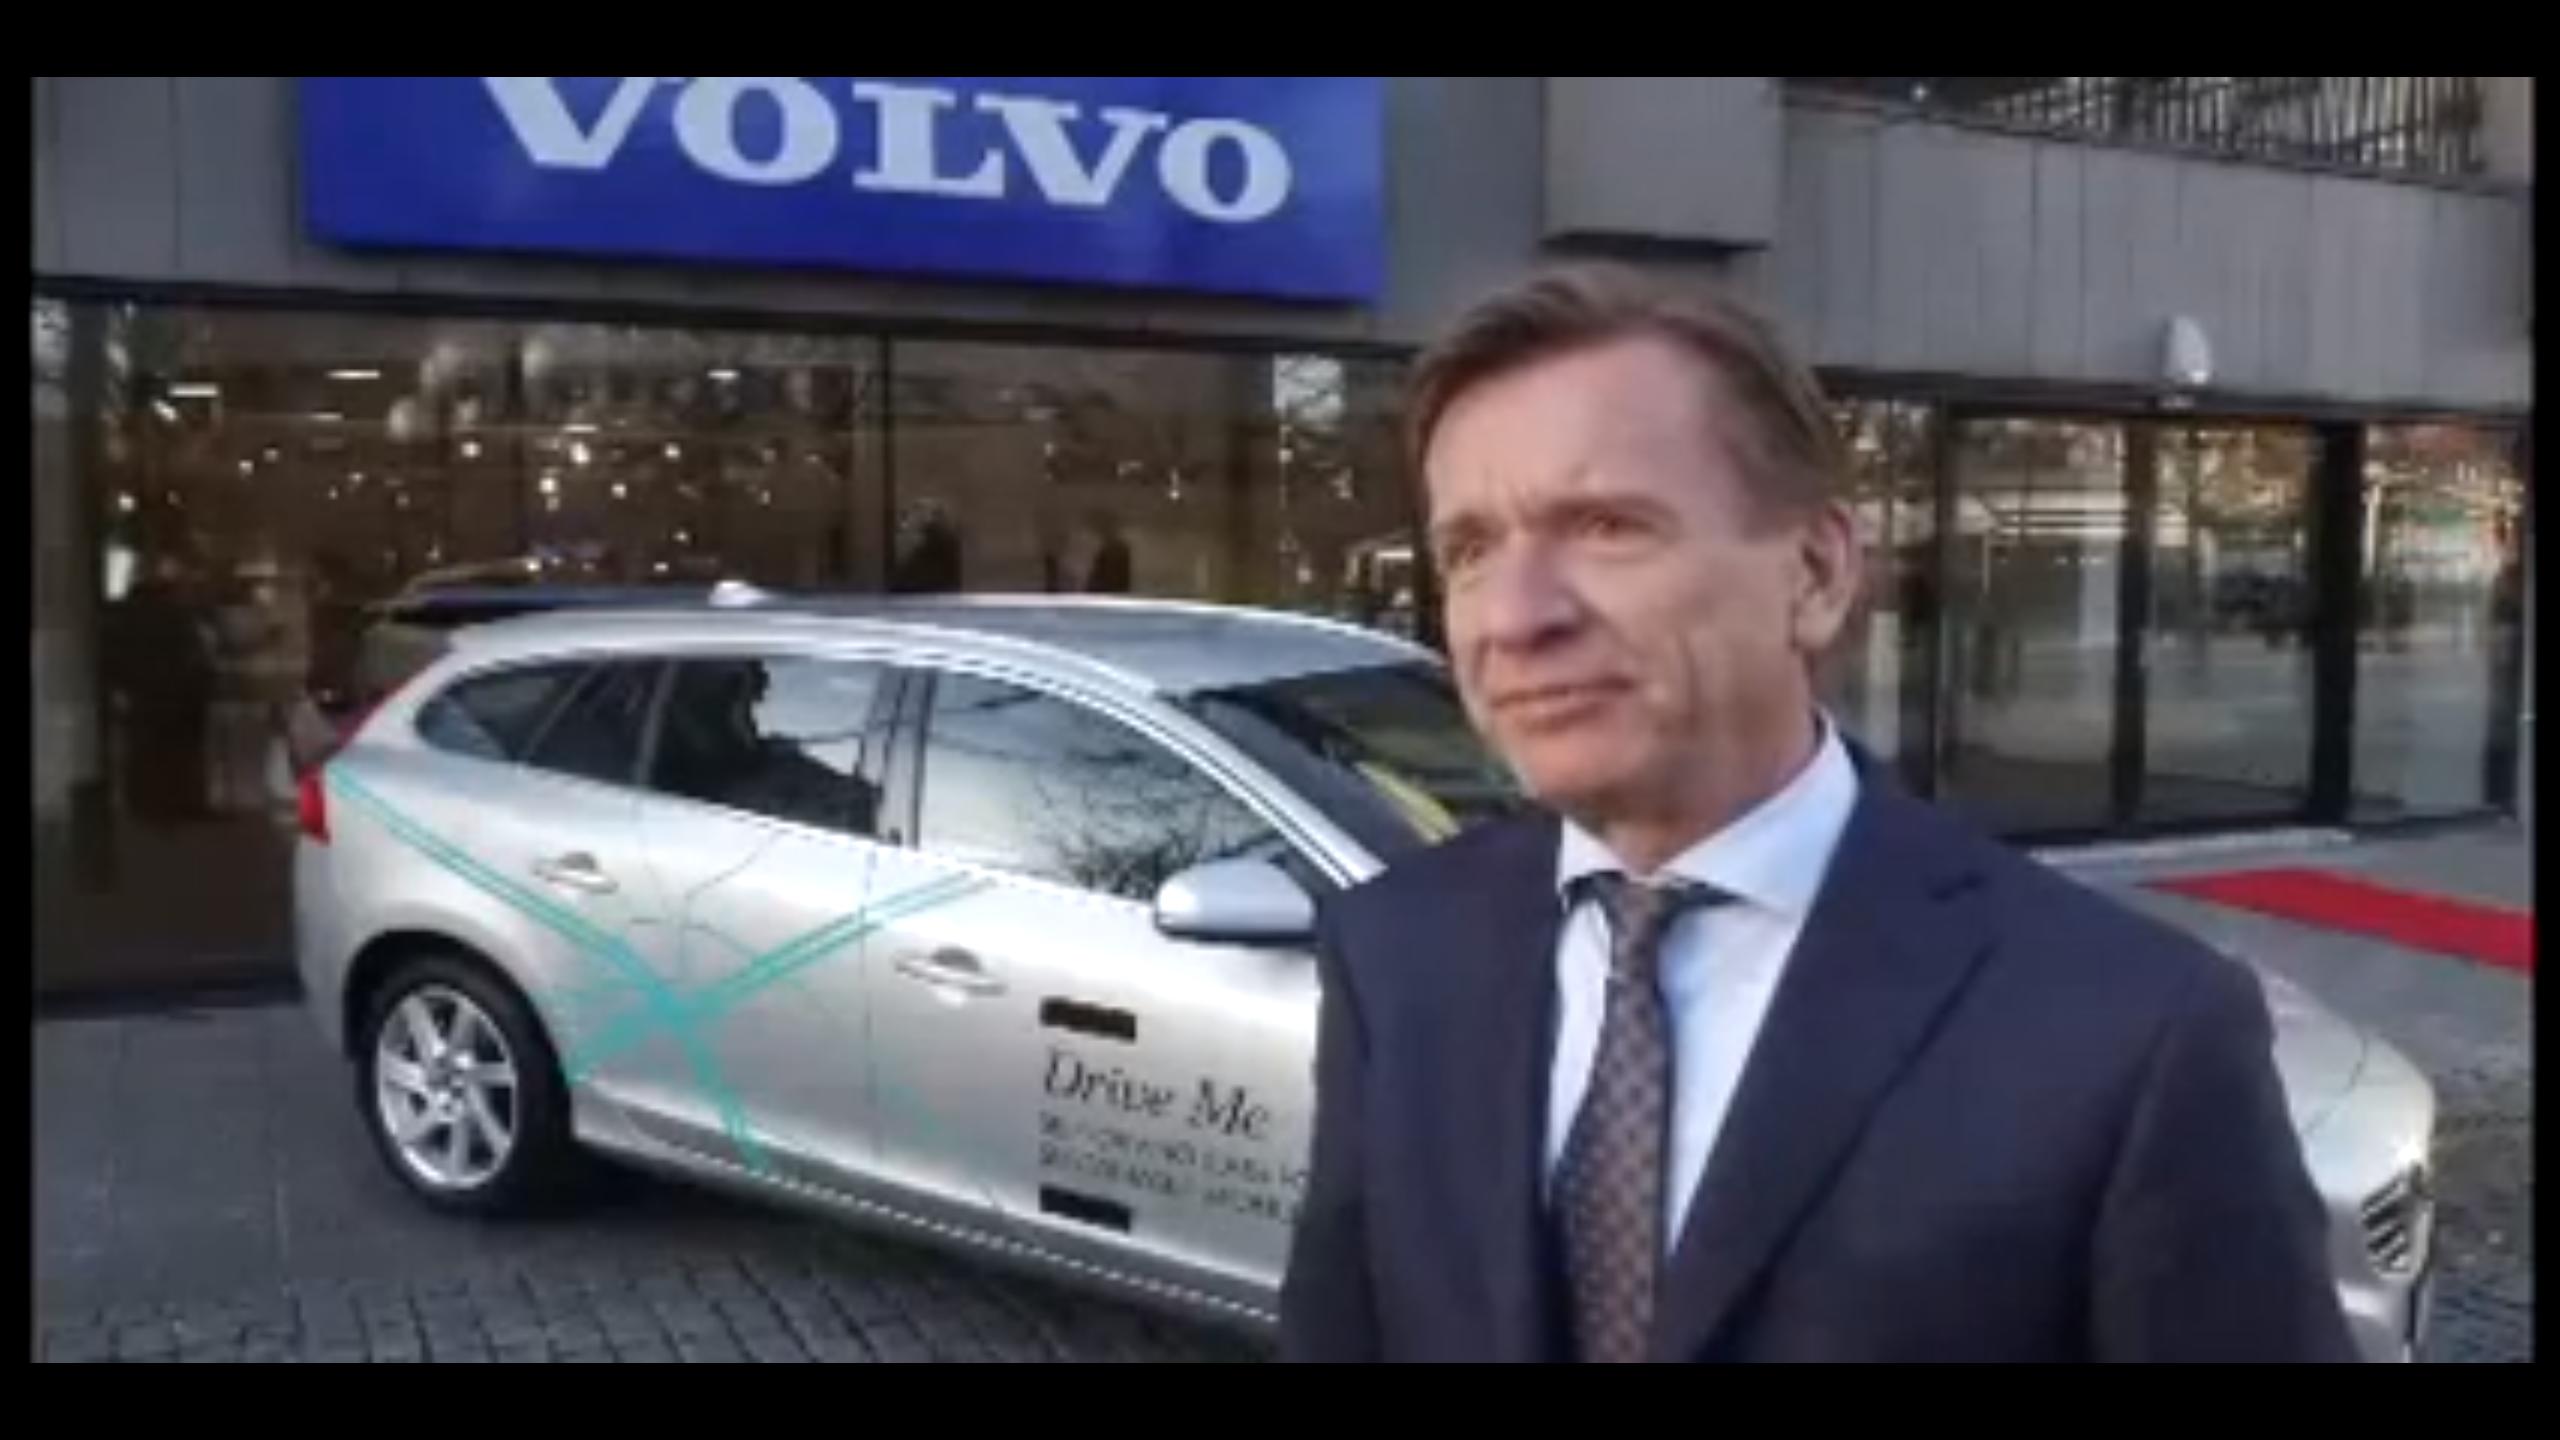 Video: Volvo Testing Self-Driving Cars On Swedish Streets